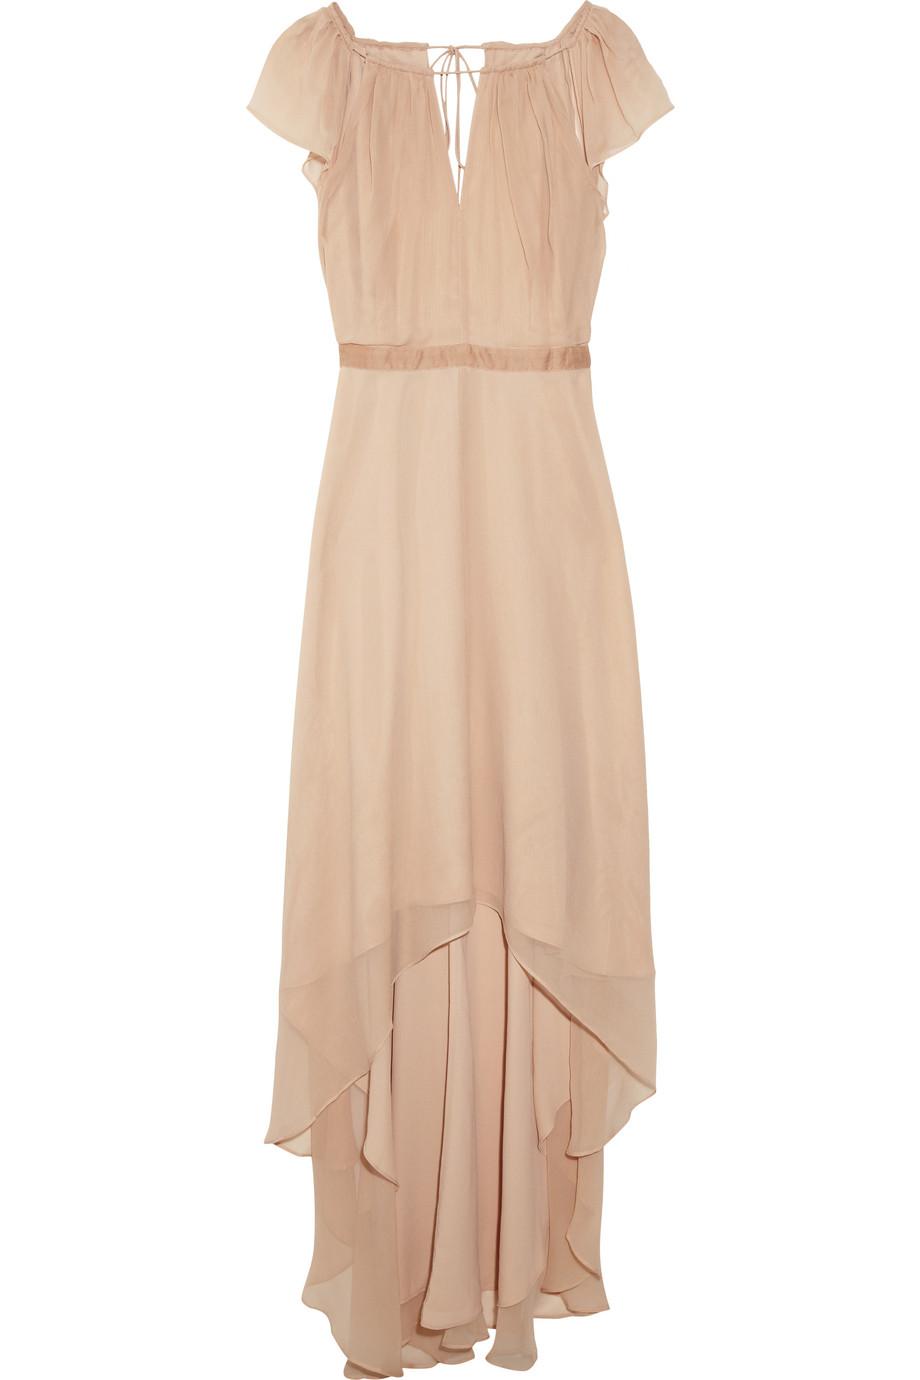 elizabeth and james sandy silk chiffon dress in pink blush lyst. Black Bedroom Furniture Sets. Home Design Ideas